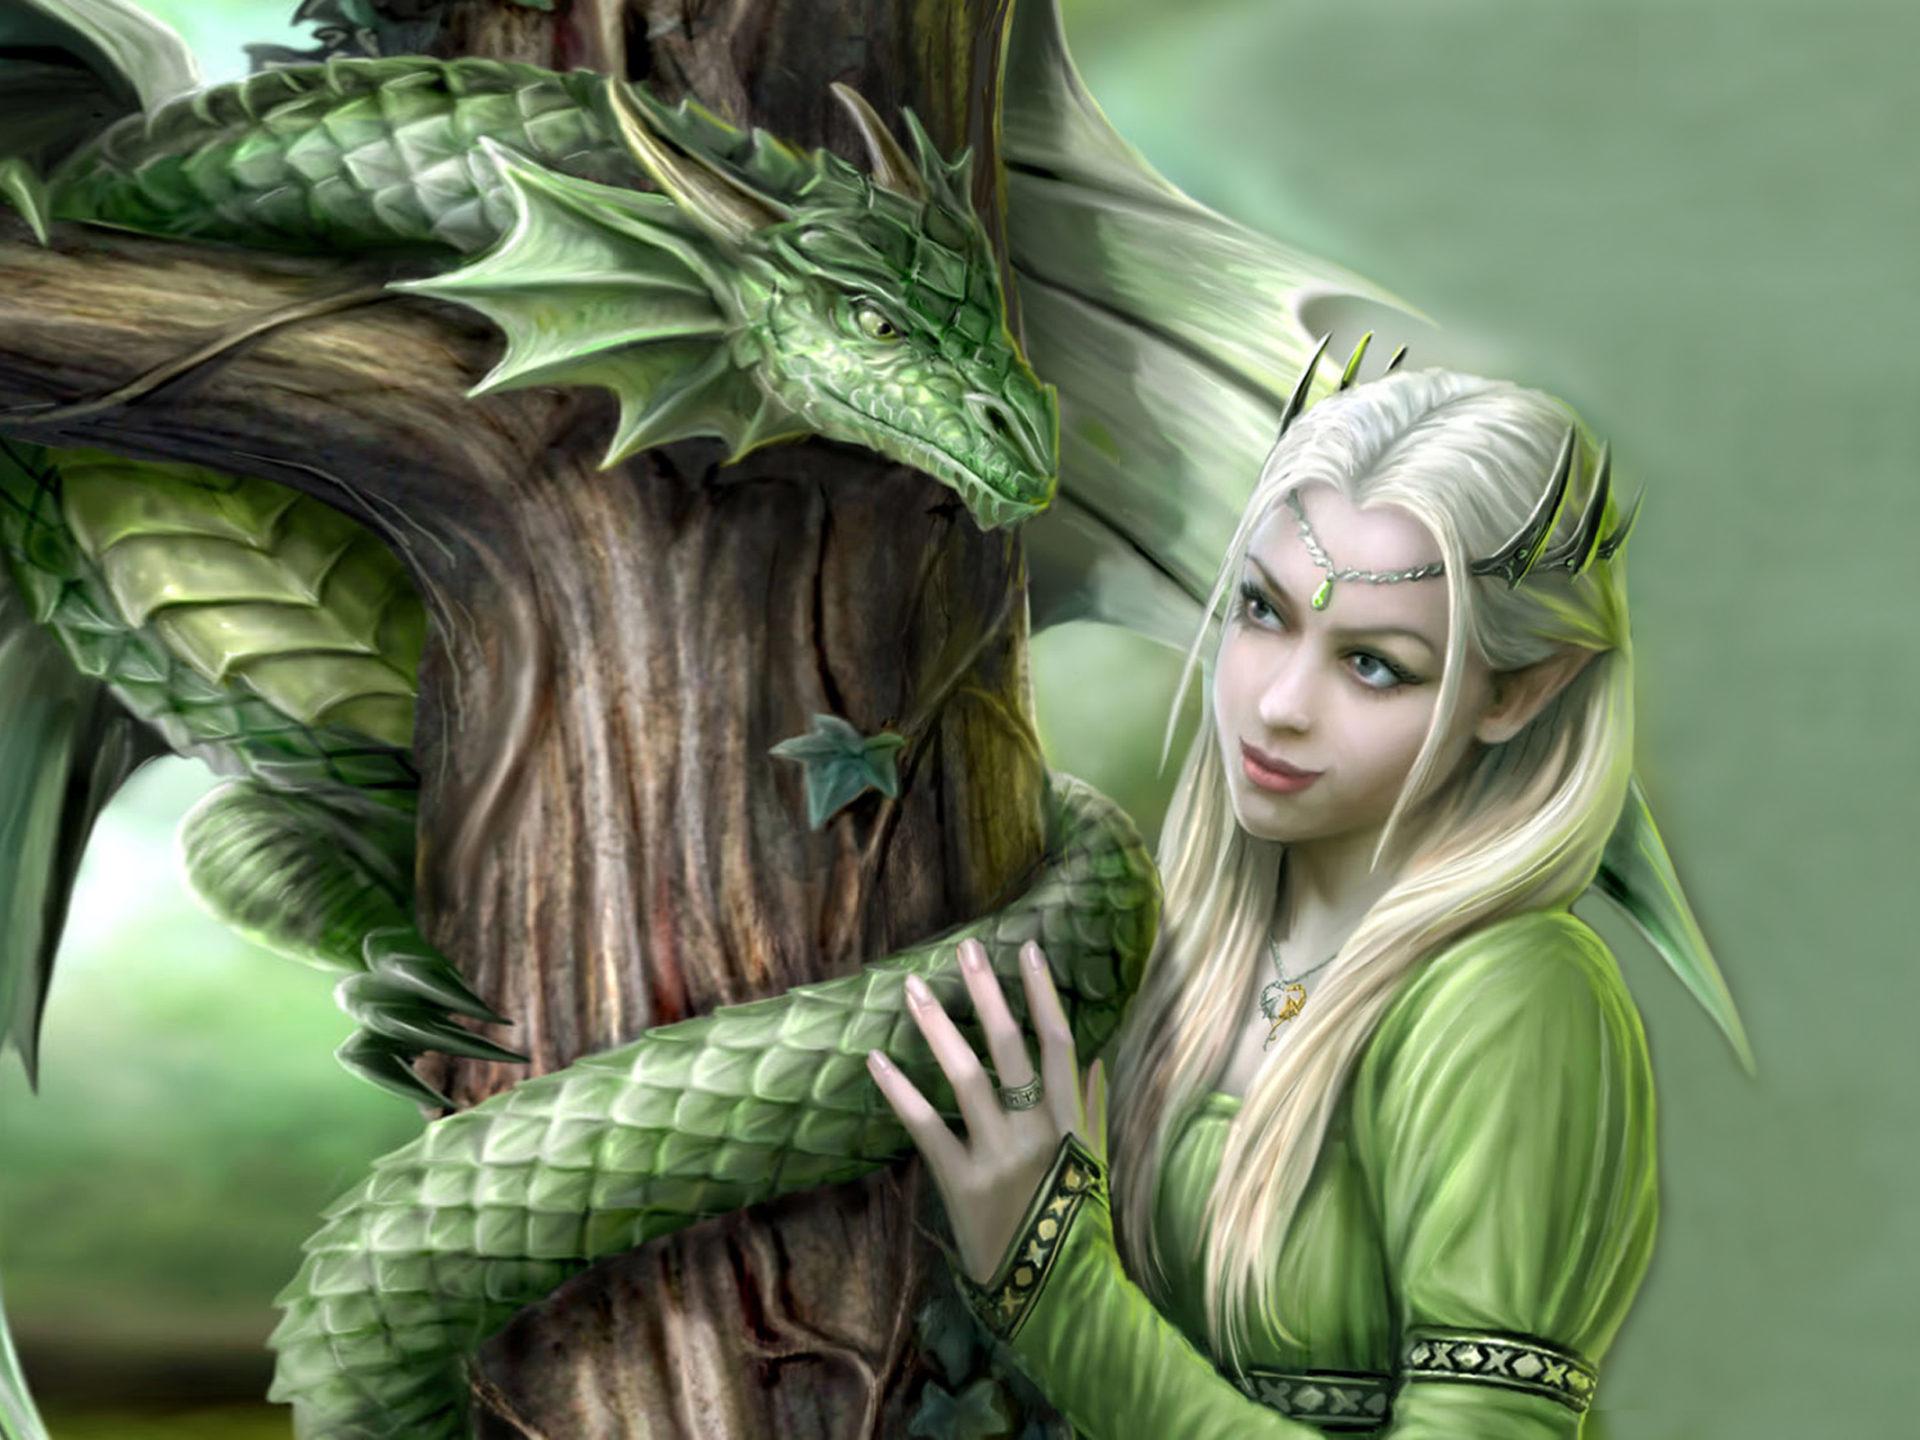 Overwatch Wallpaper Girls Green Dragon And Princess Fantasy Digital Art Hd Desktop